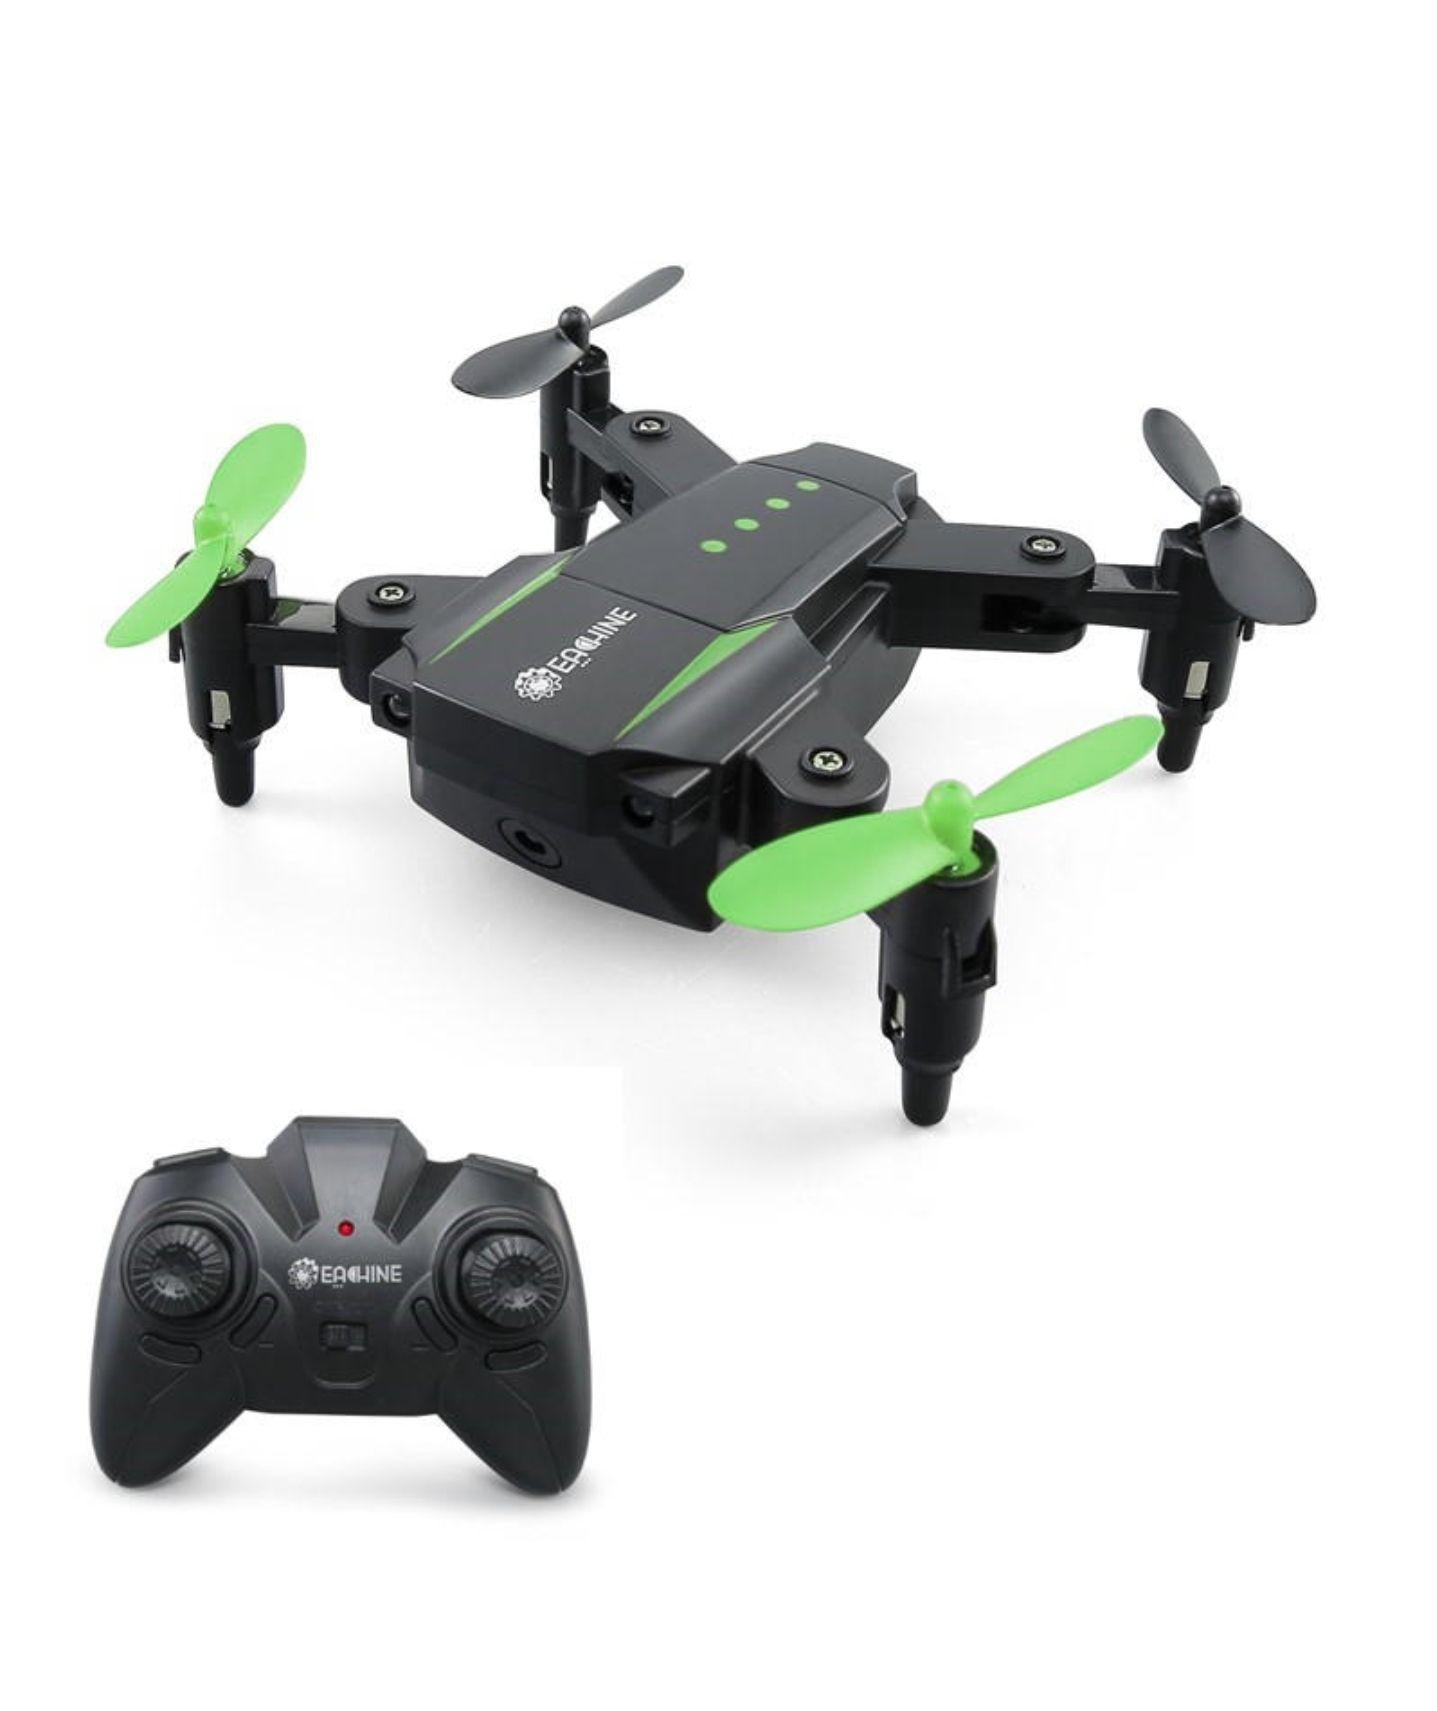 Twee (!) mini qaudcopters voor 13.68